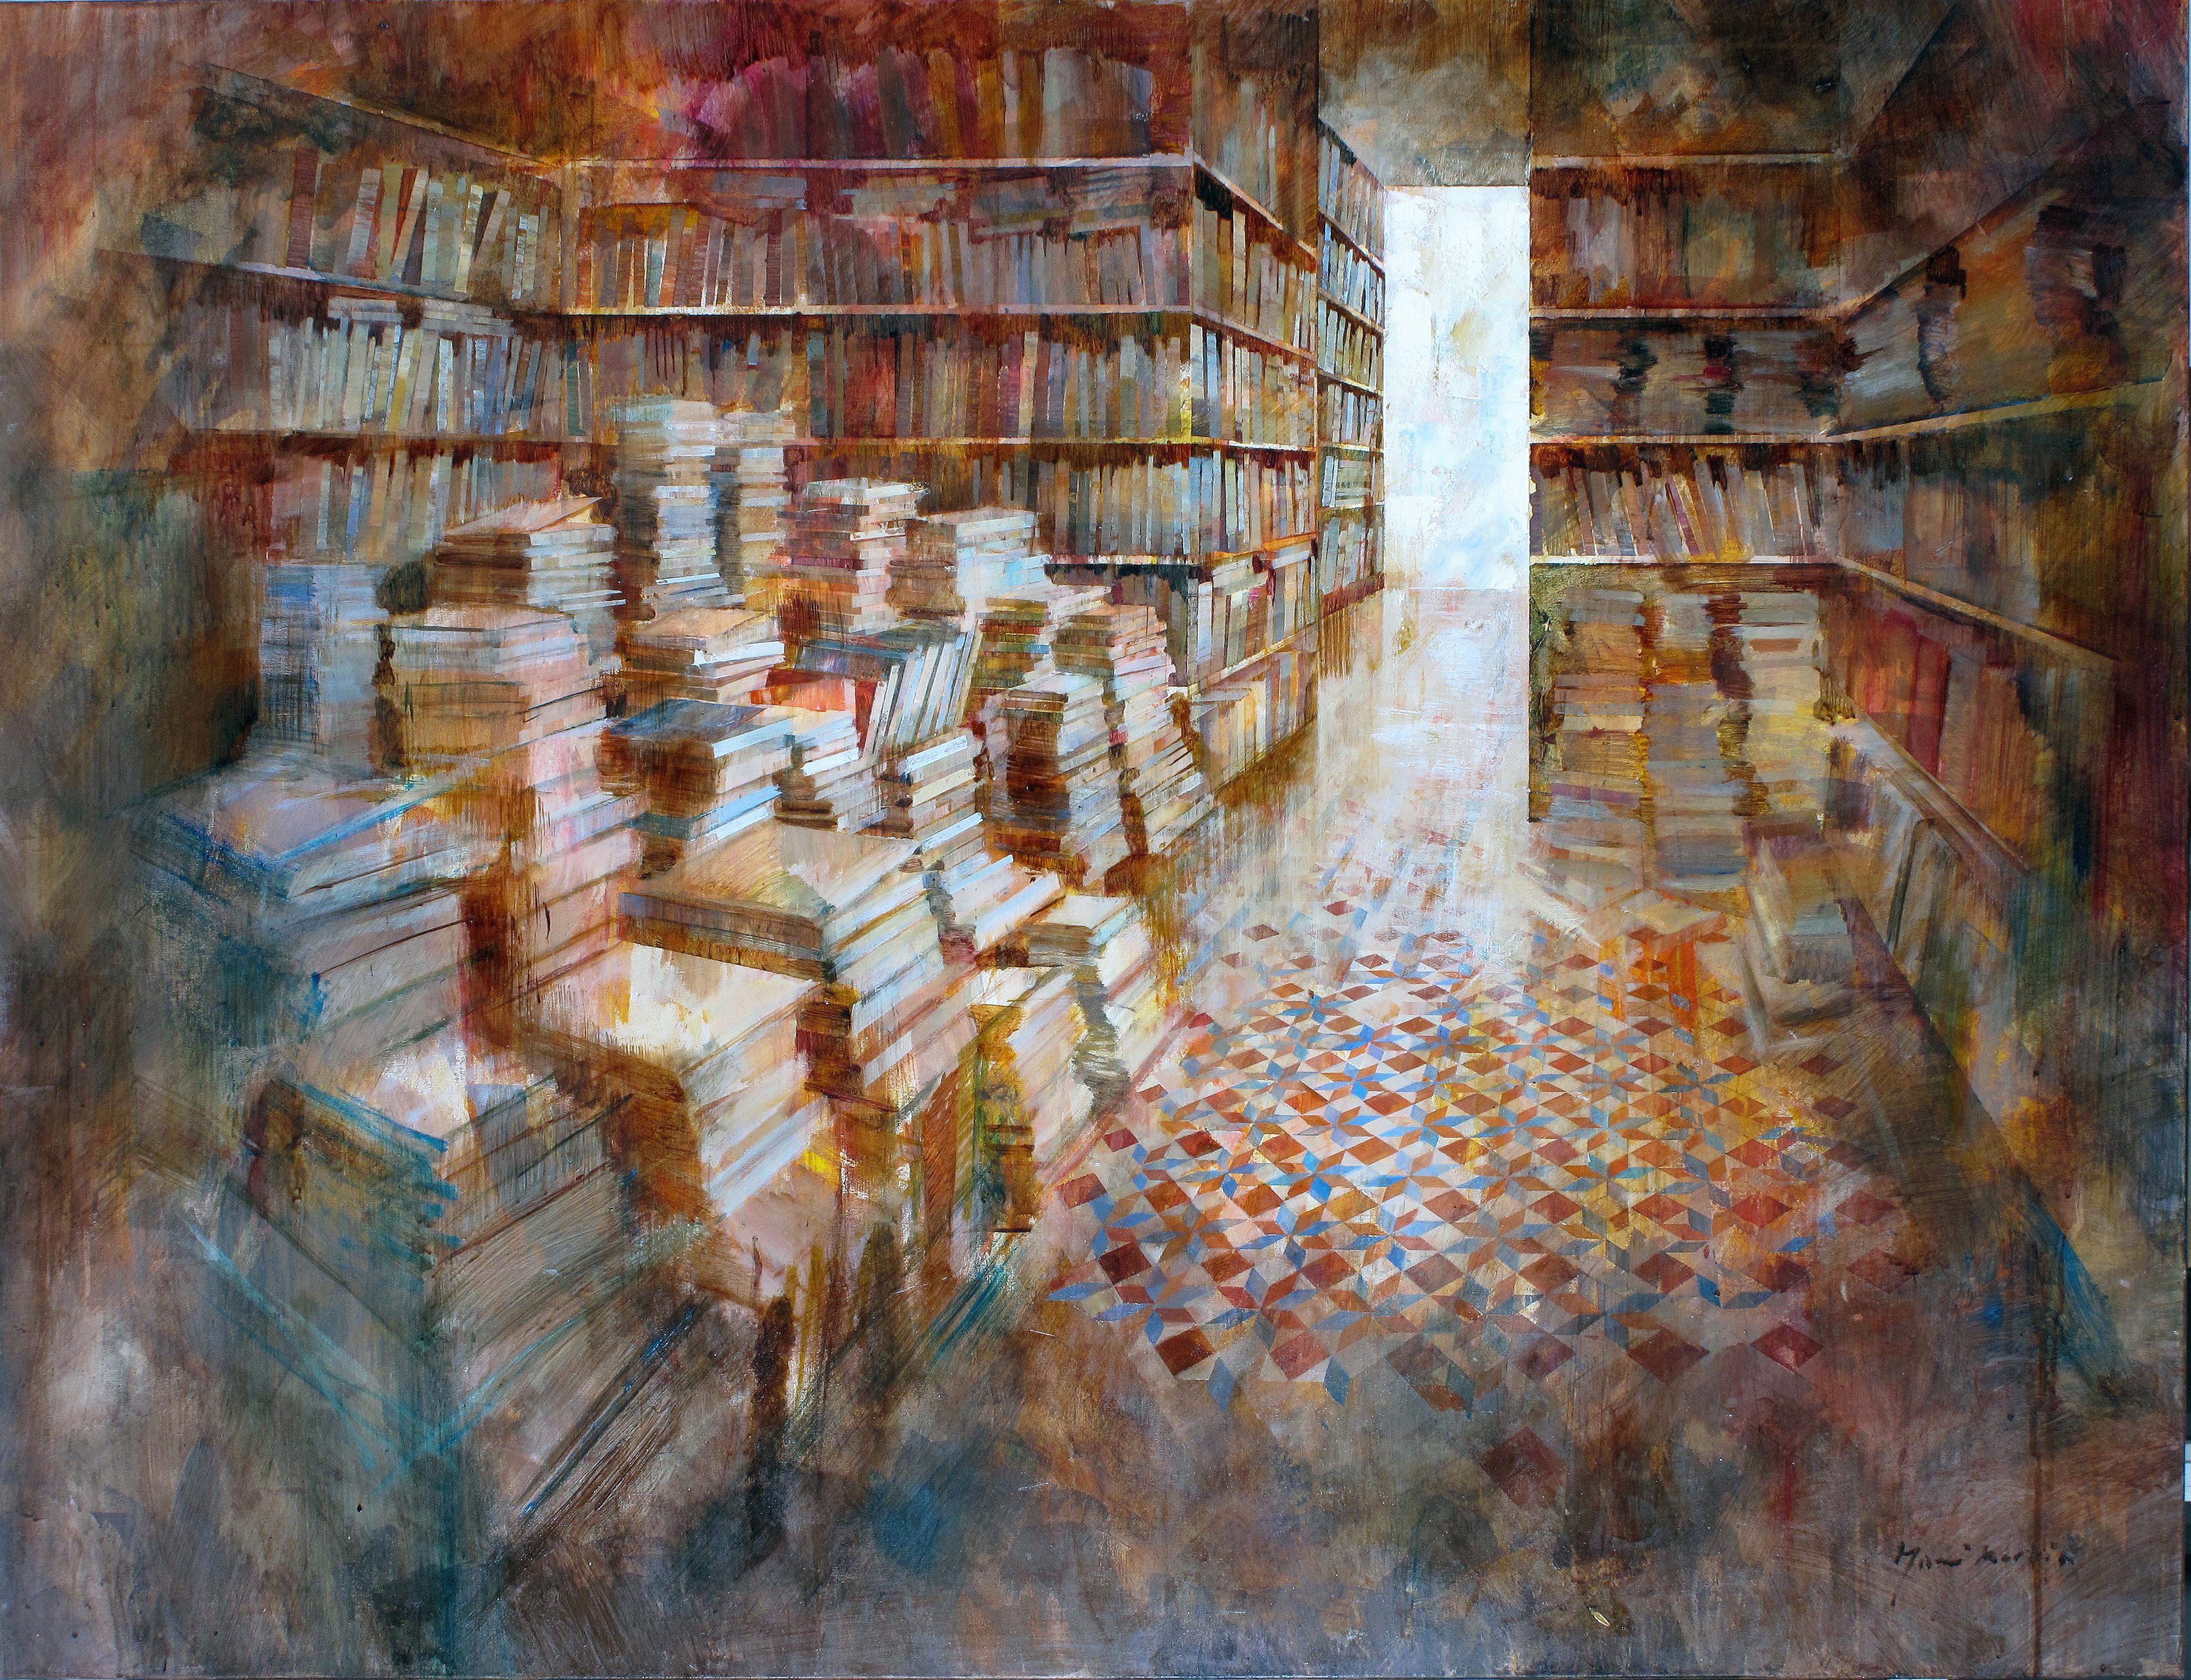 Bookshop - 100 x 130 cm